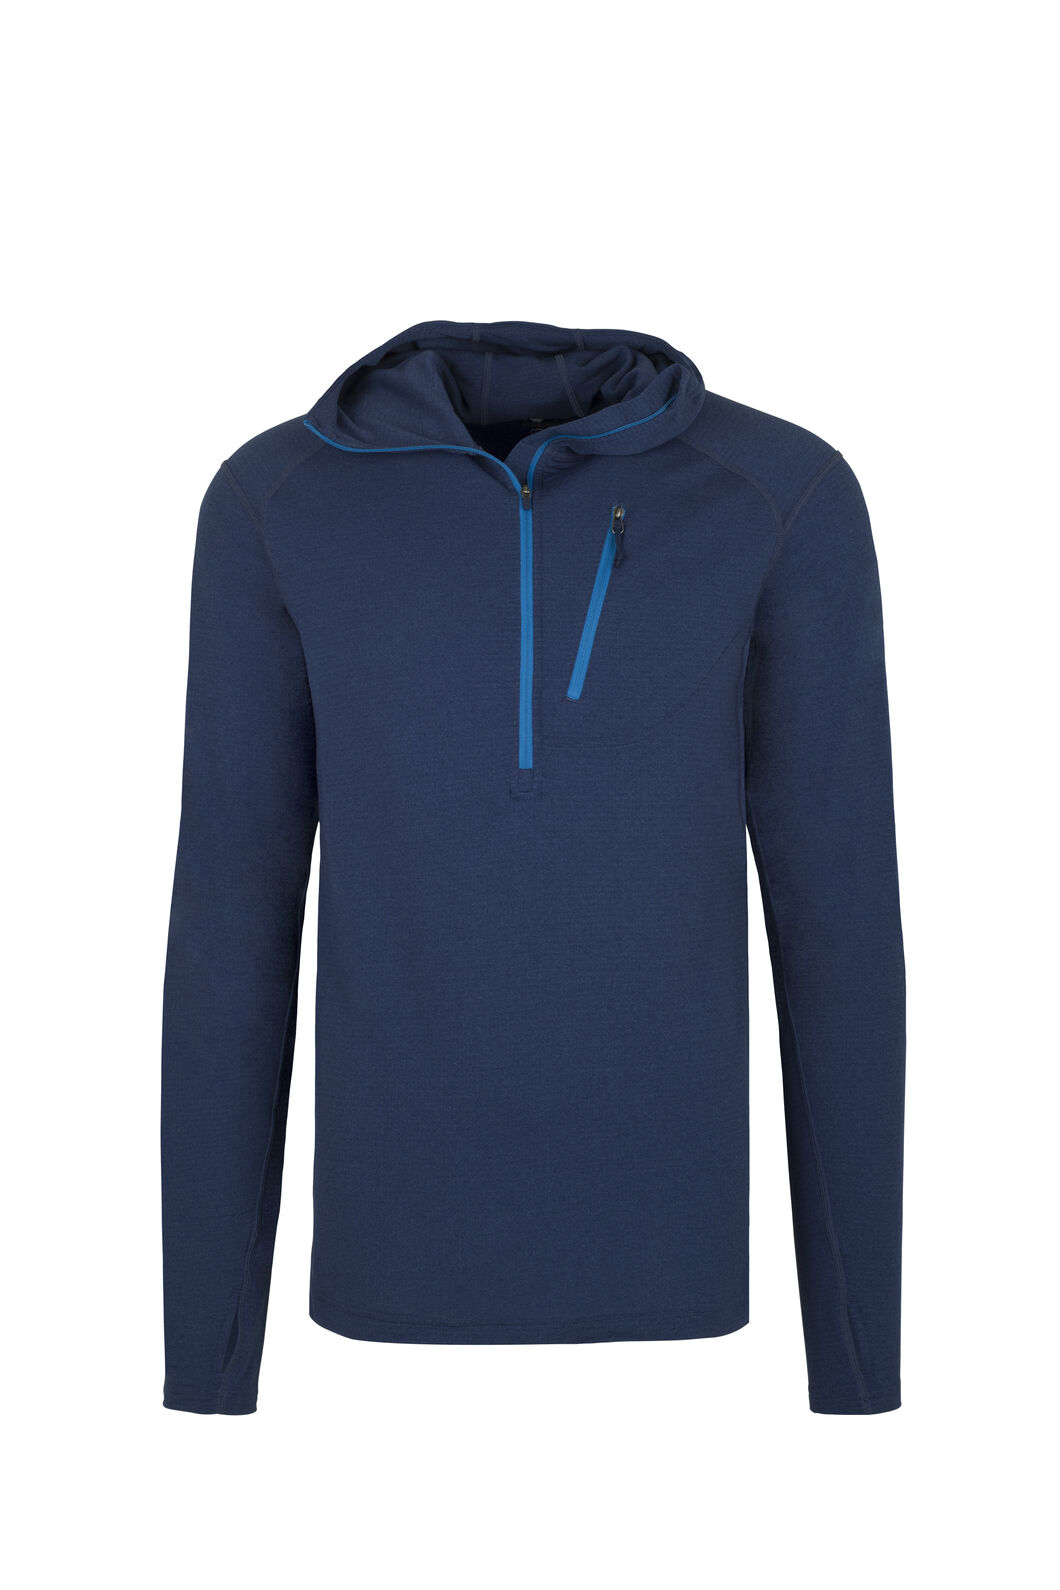 Macpac Prothermal Polartec® Hooded Pullover — Men's, Medieval Blue, hi-res